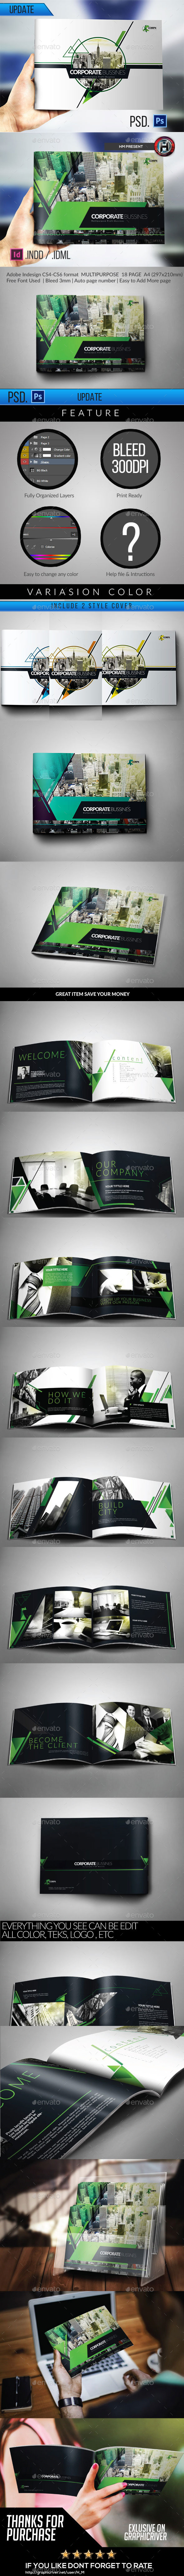 Multipurpose Modern Corporate Geometris Brochure - Corporate Brochures